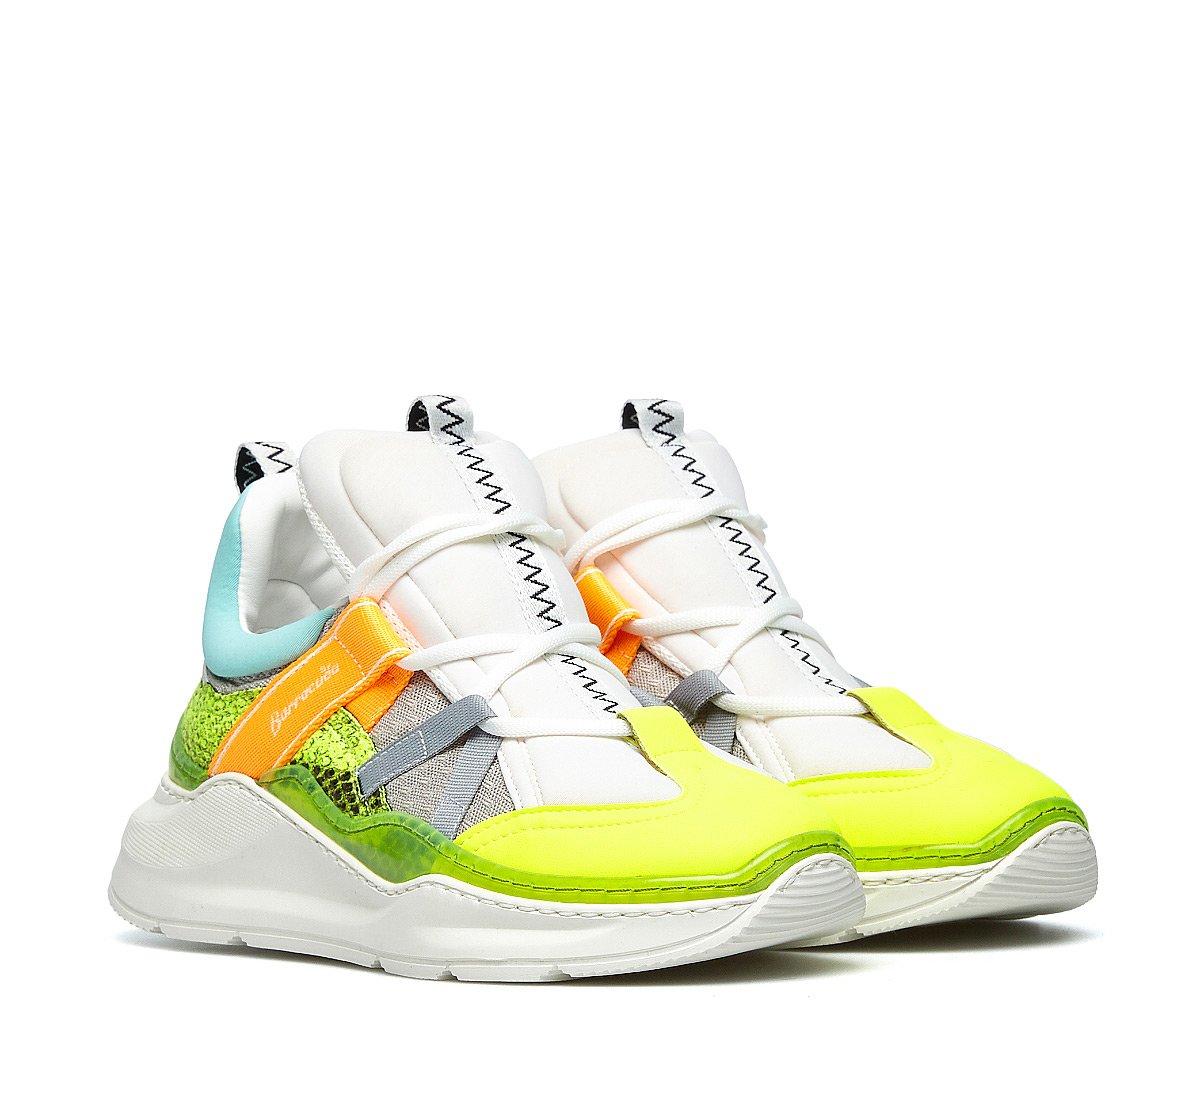 Barracuda Happiness sneakers